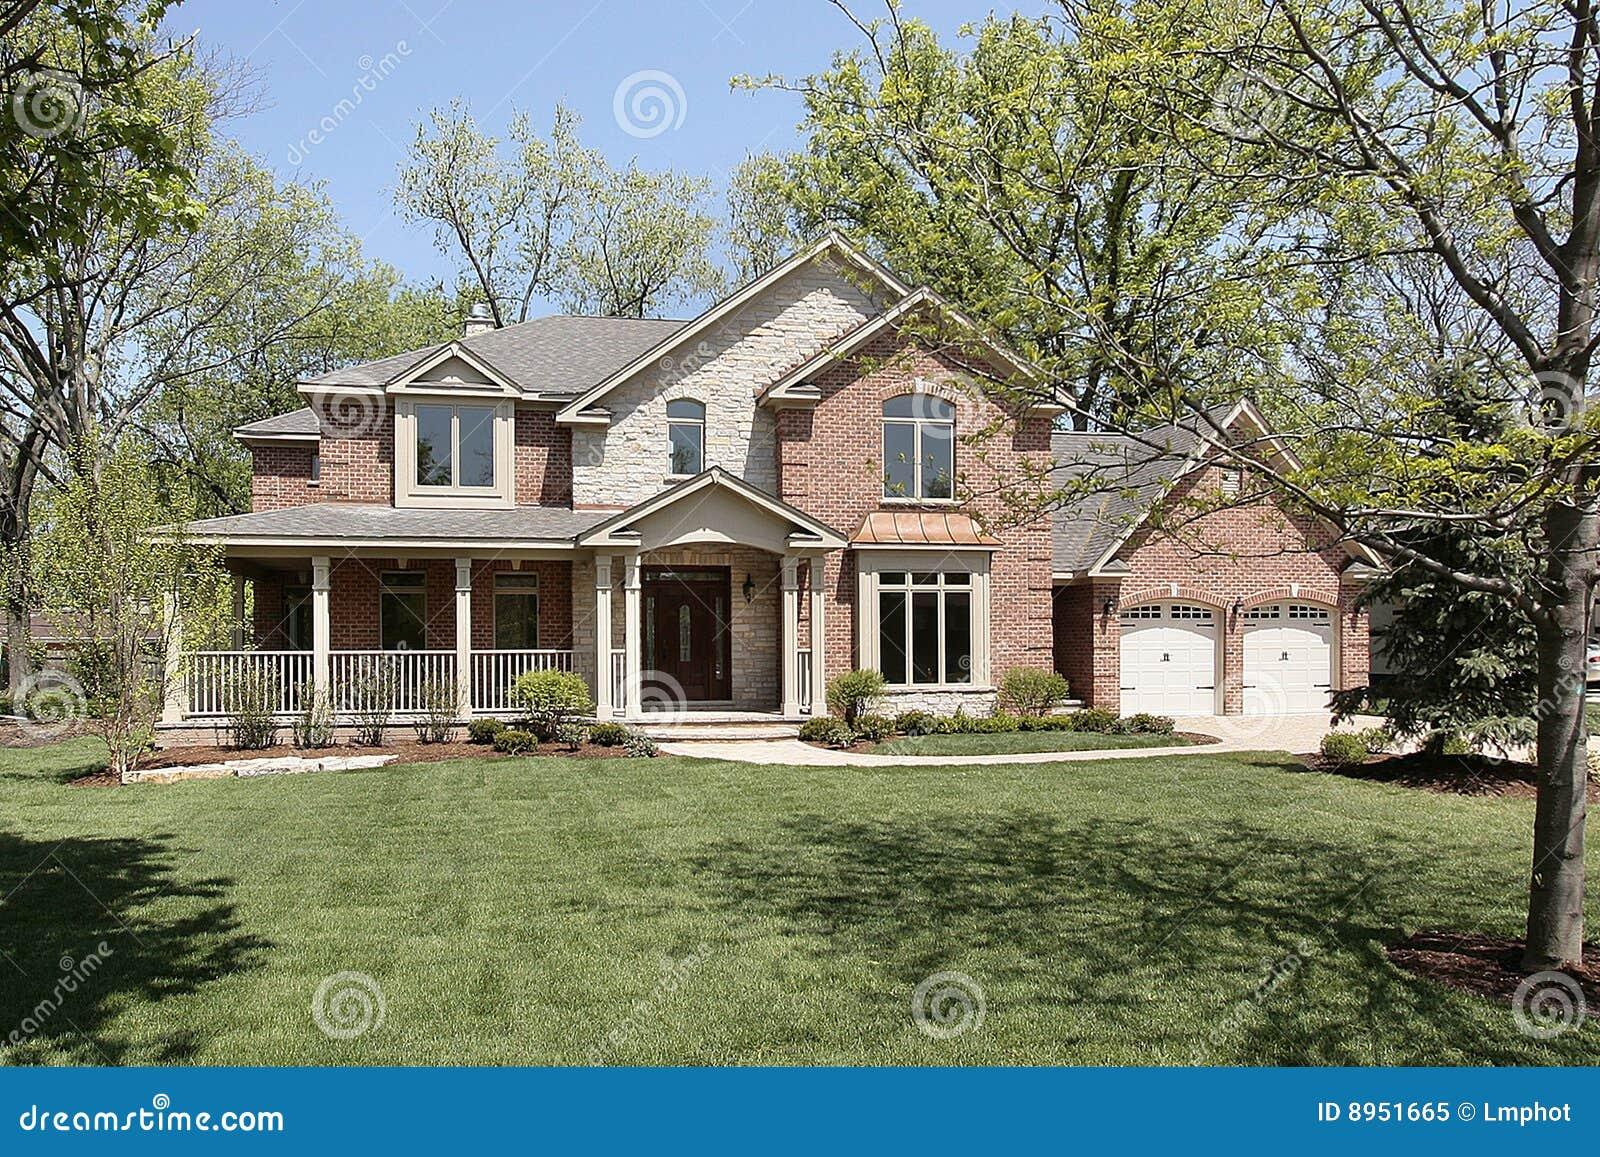 New Construction Brick Home Royalty Free Stock Photo